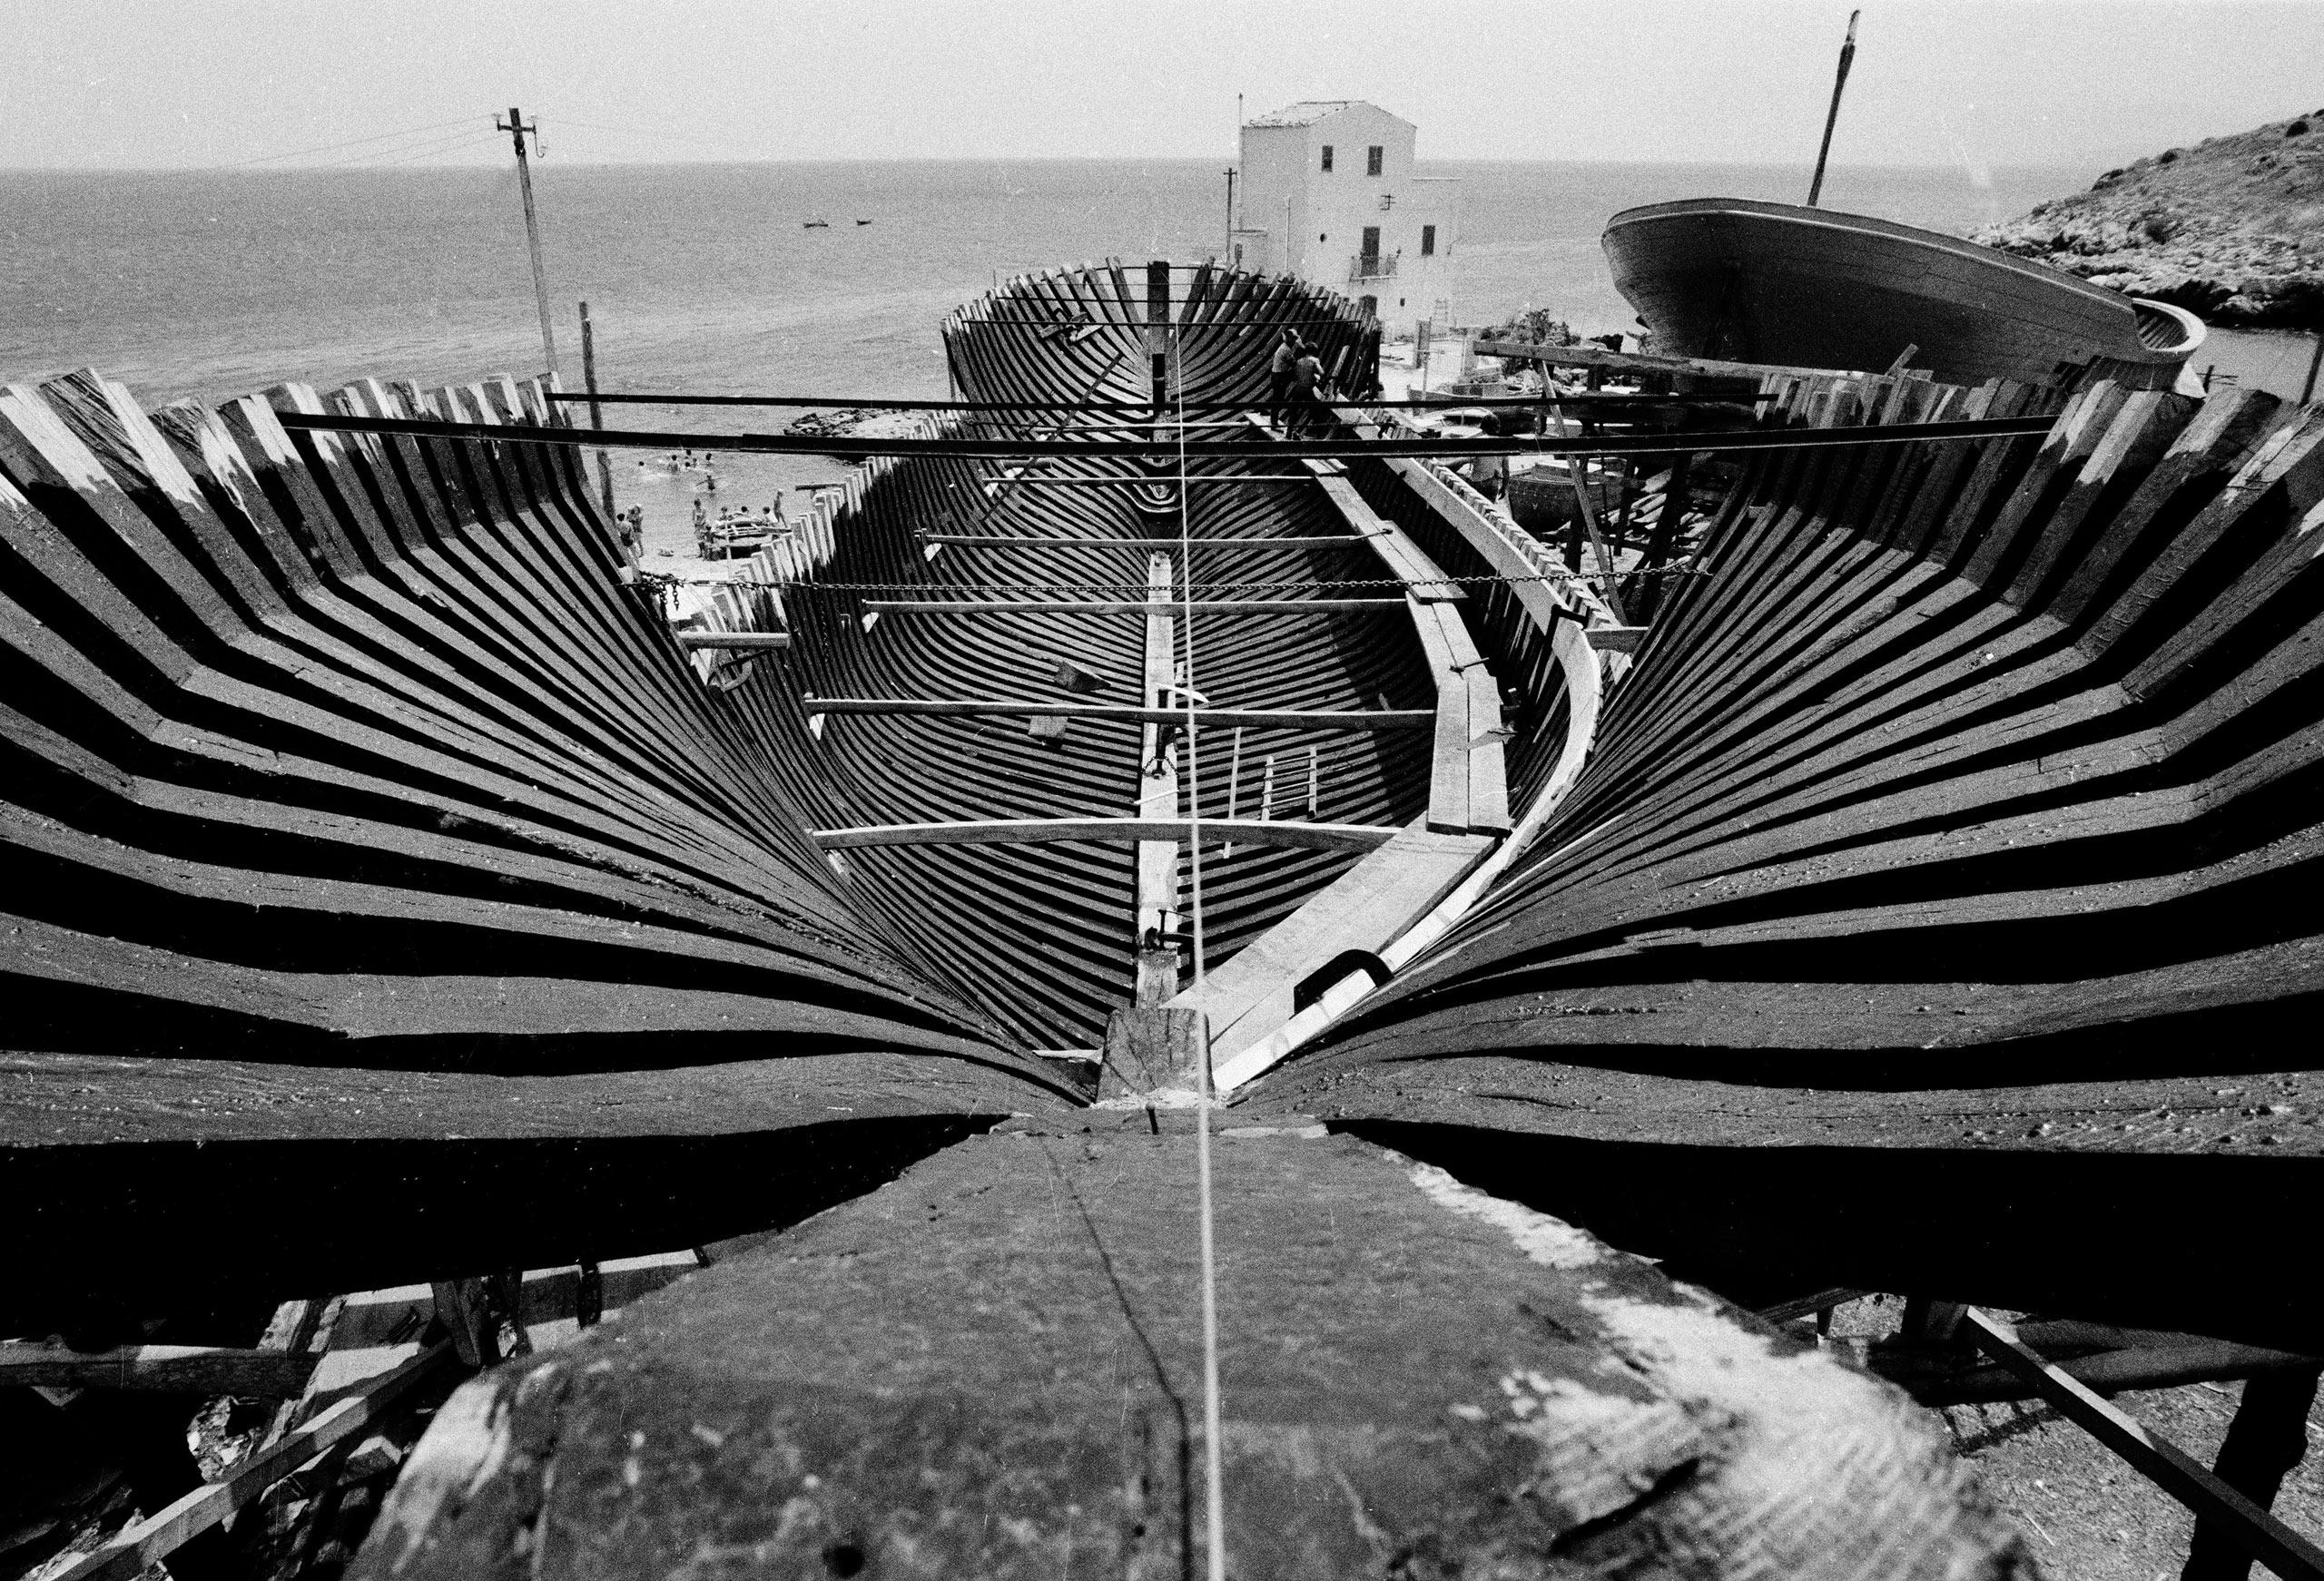 Boat Under Construction, Mediterranean sea.